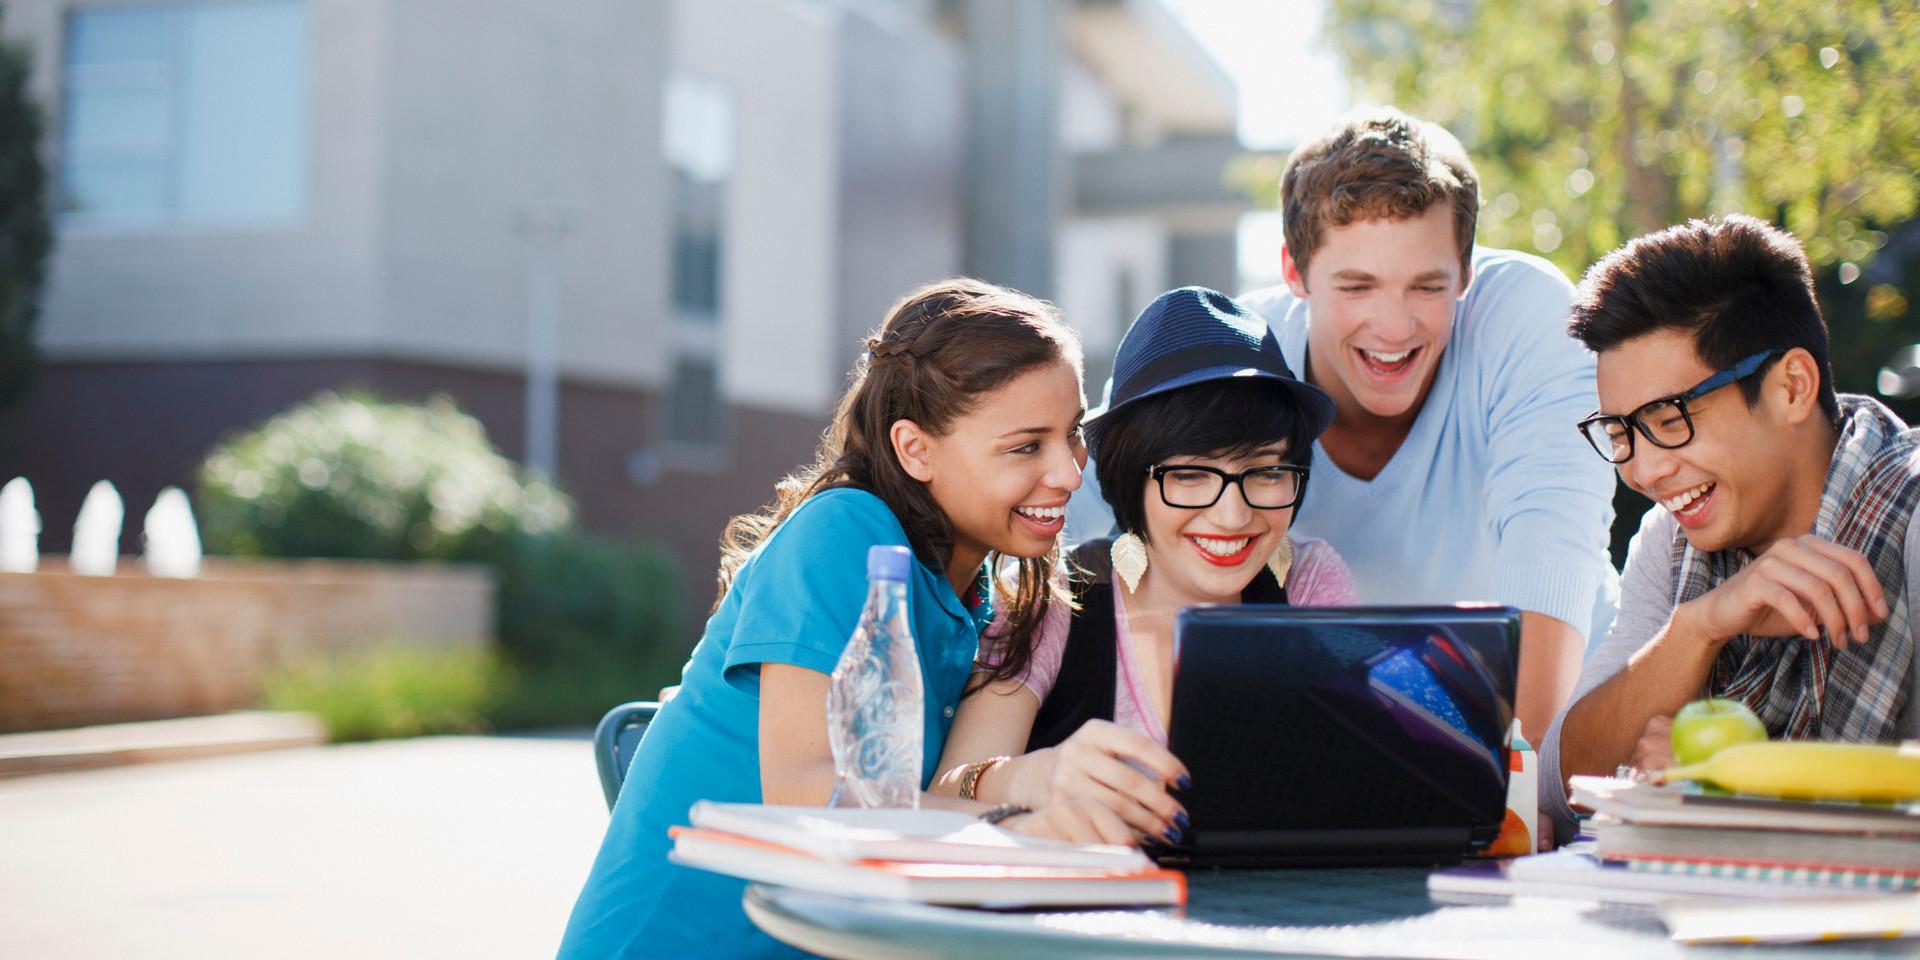 o-SMILING-STUDENTS-facebook.jpg